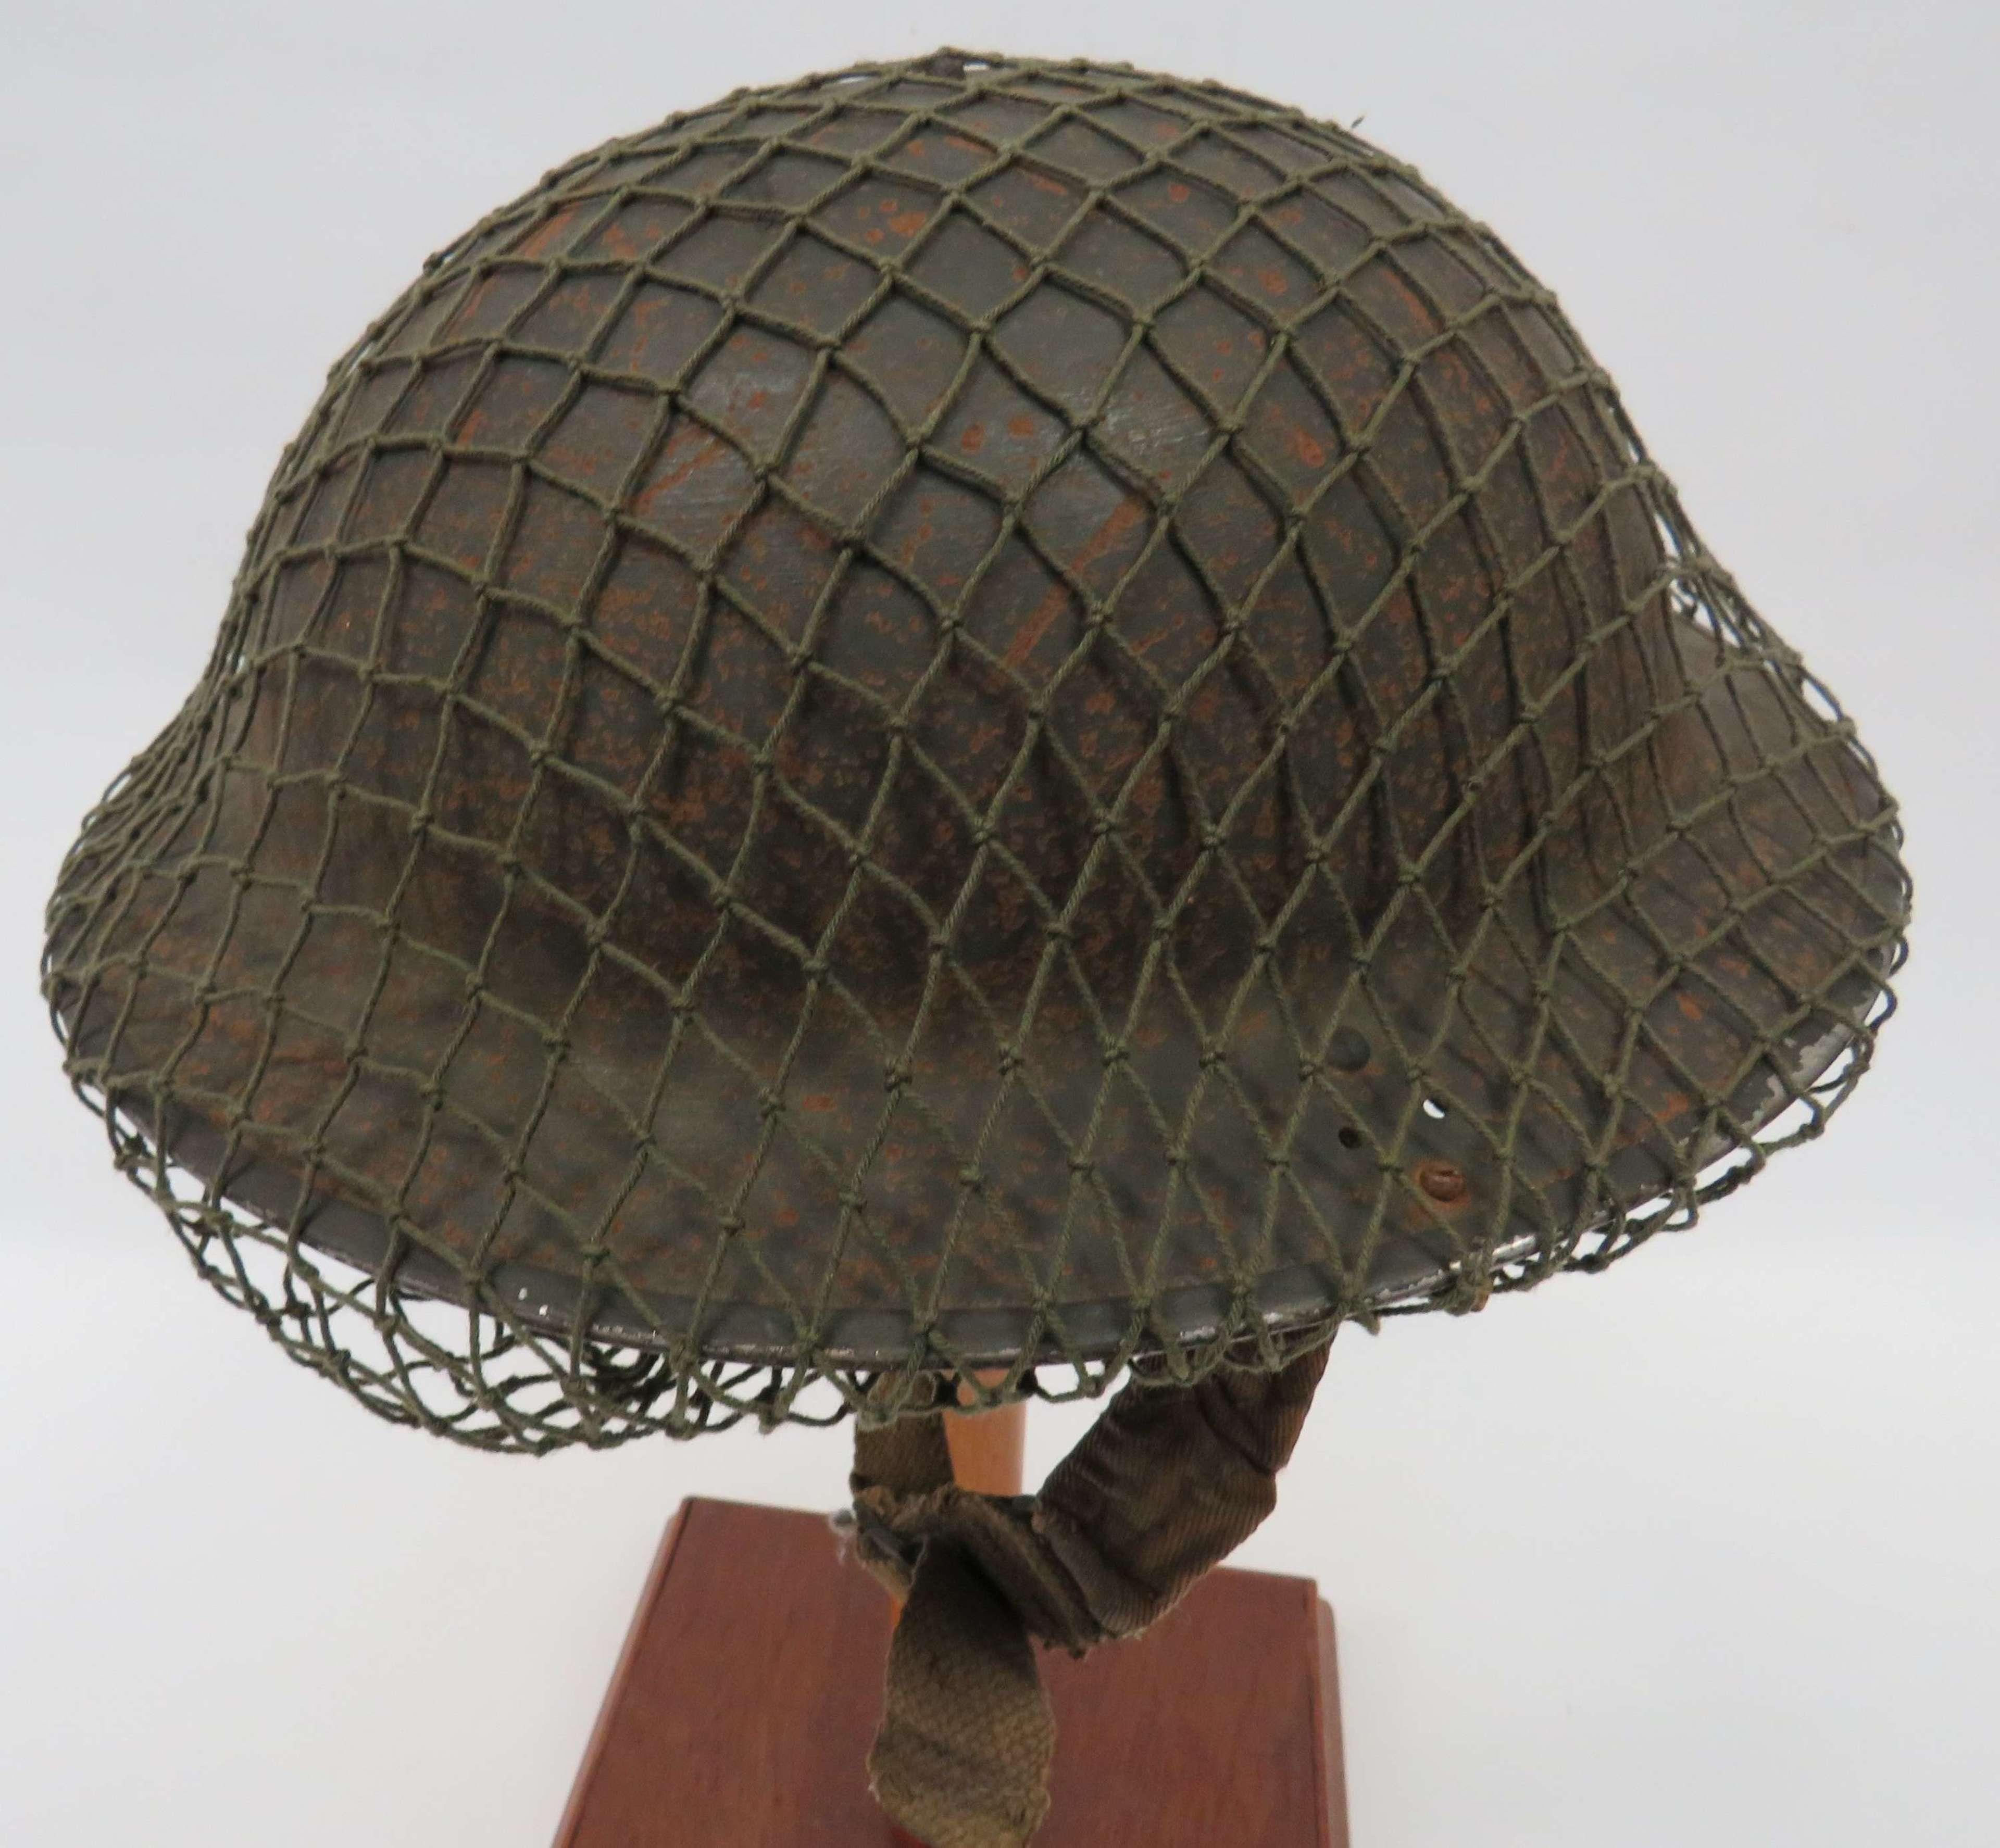 WW 2 British Mk 11C Home Guard Steel Helmet and Netting Cover